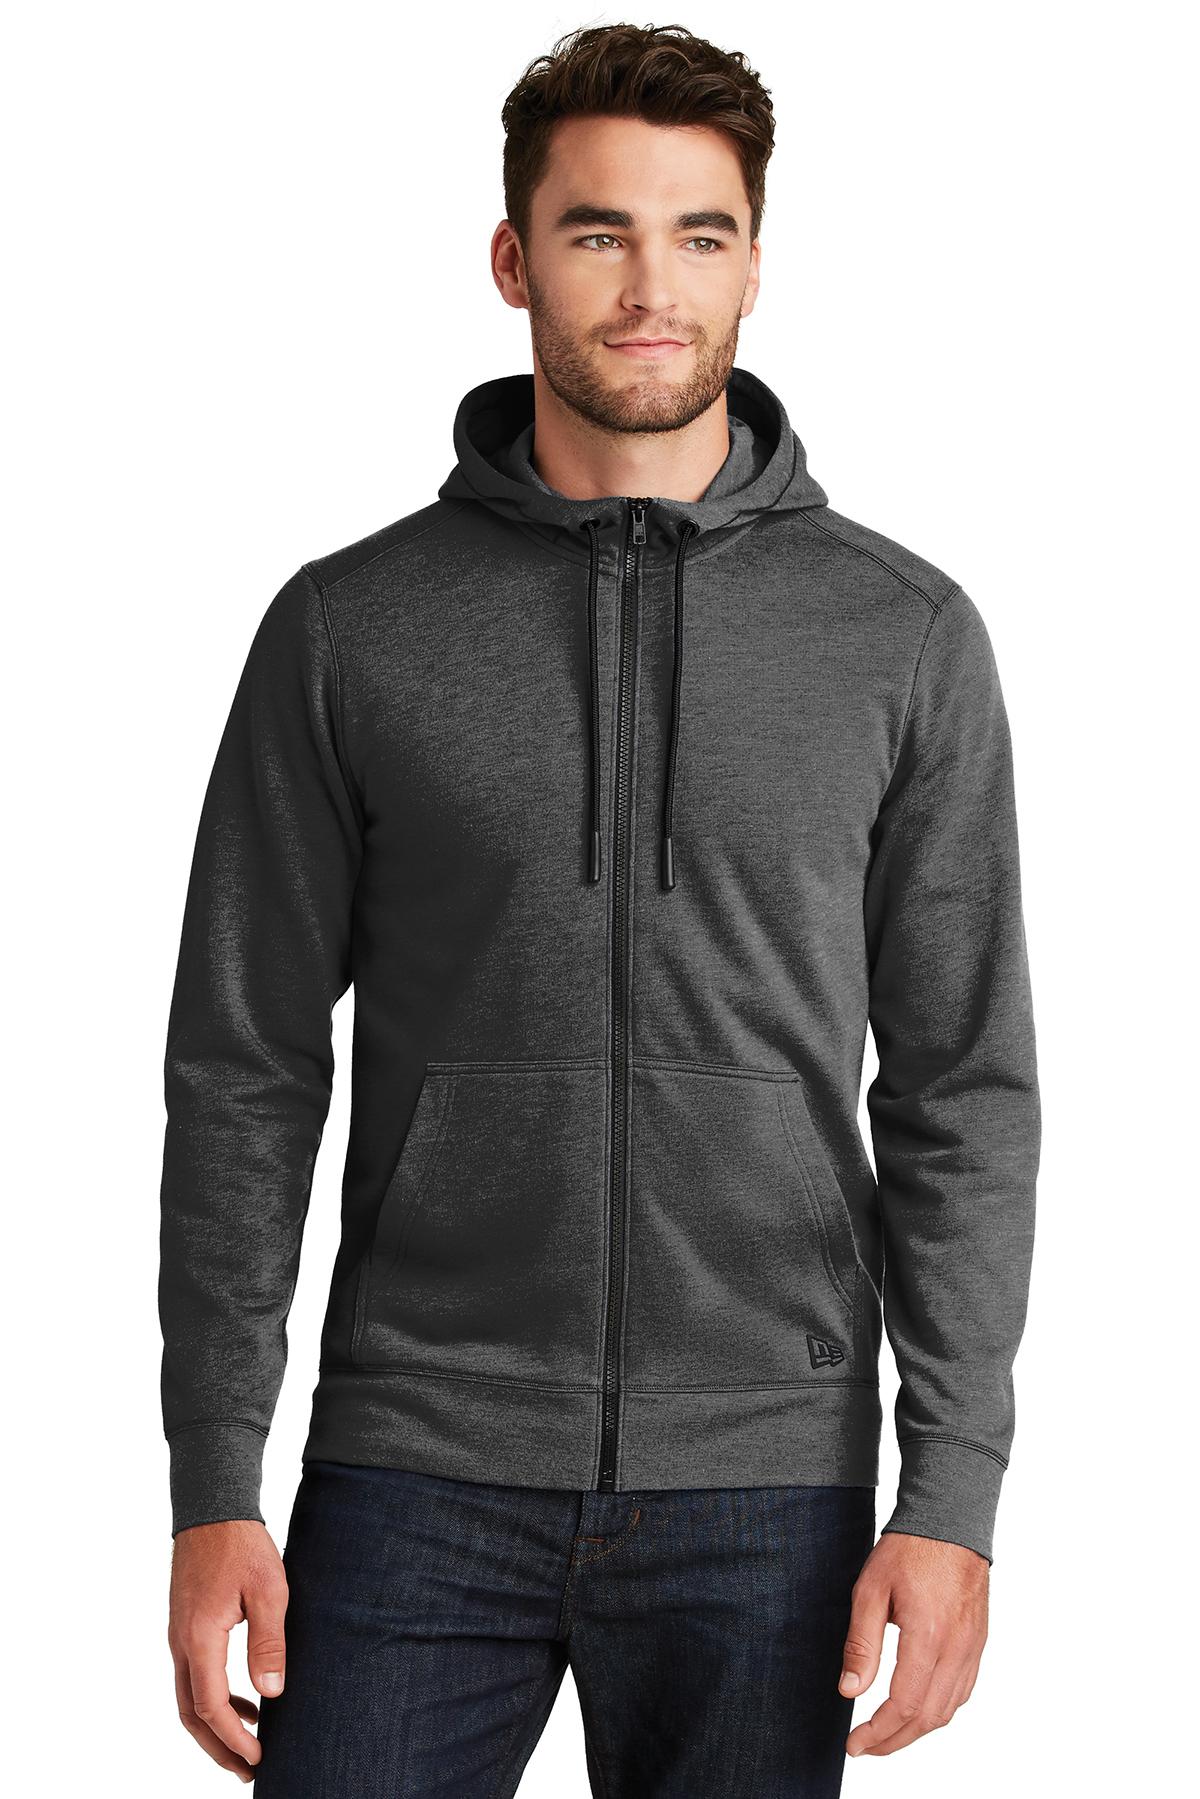 New Era NEA511 - Men's Tri-Blend Fleece Full Zip Hoodie